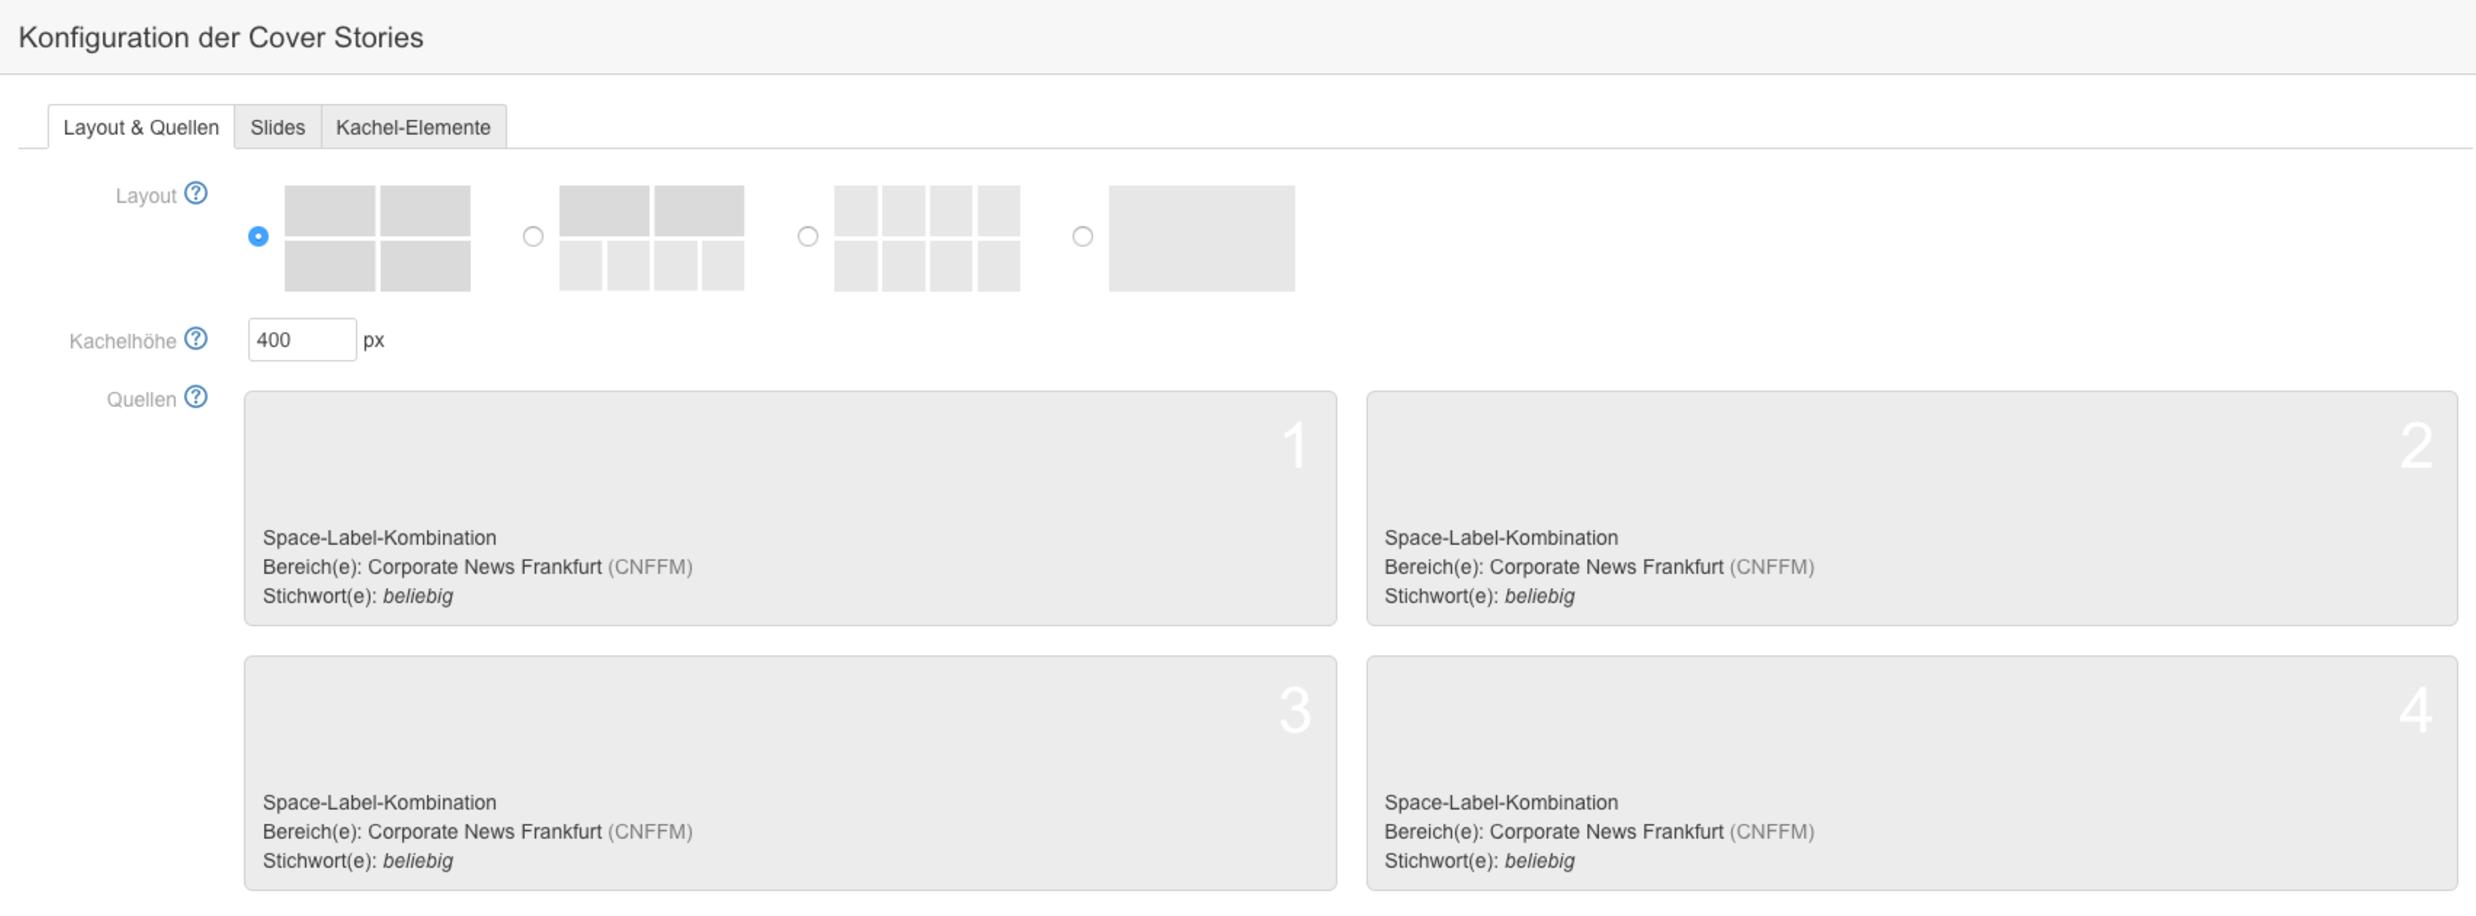 Kachel layout  Enterprise News Bundle 1.5 für Confluence: Facelift für die Cover ...